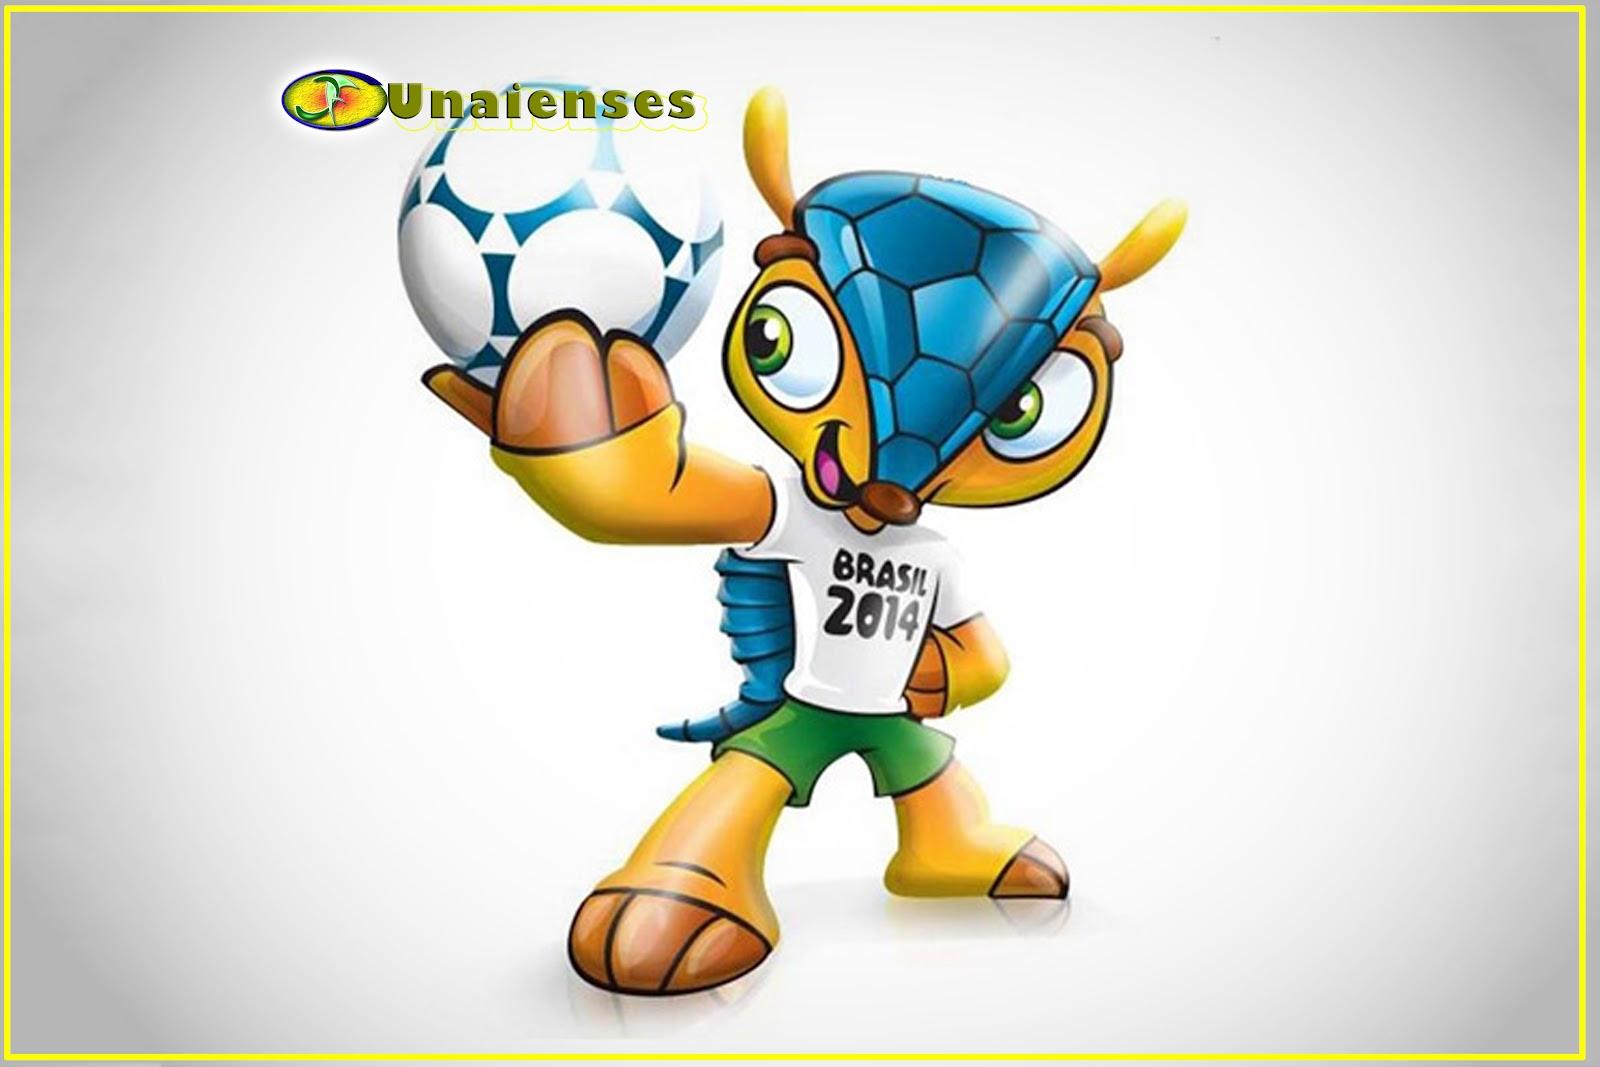 http://1.bp.blogspot.com/-hPpHS0uuba0/UF9LAcgsYYI/AAAAAAAACoY/NbL_EEtG0v0/s1600/120923+-+UNAIENSES-+O+Mascote+da+Copa+02.jpg